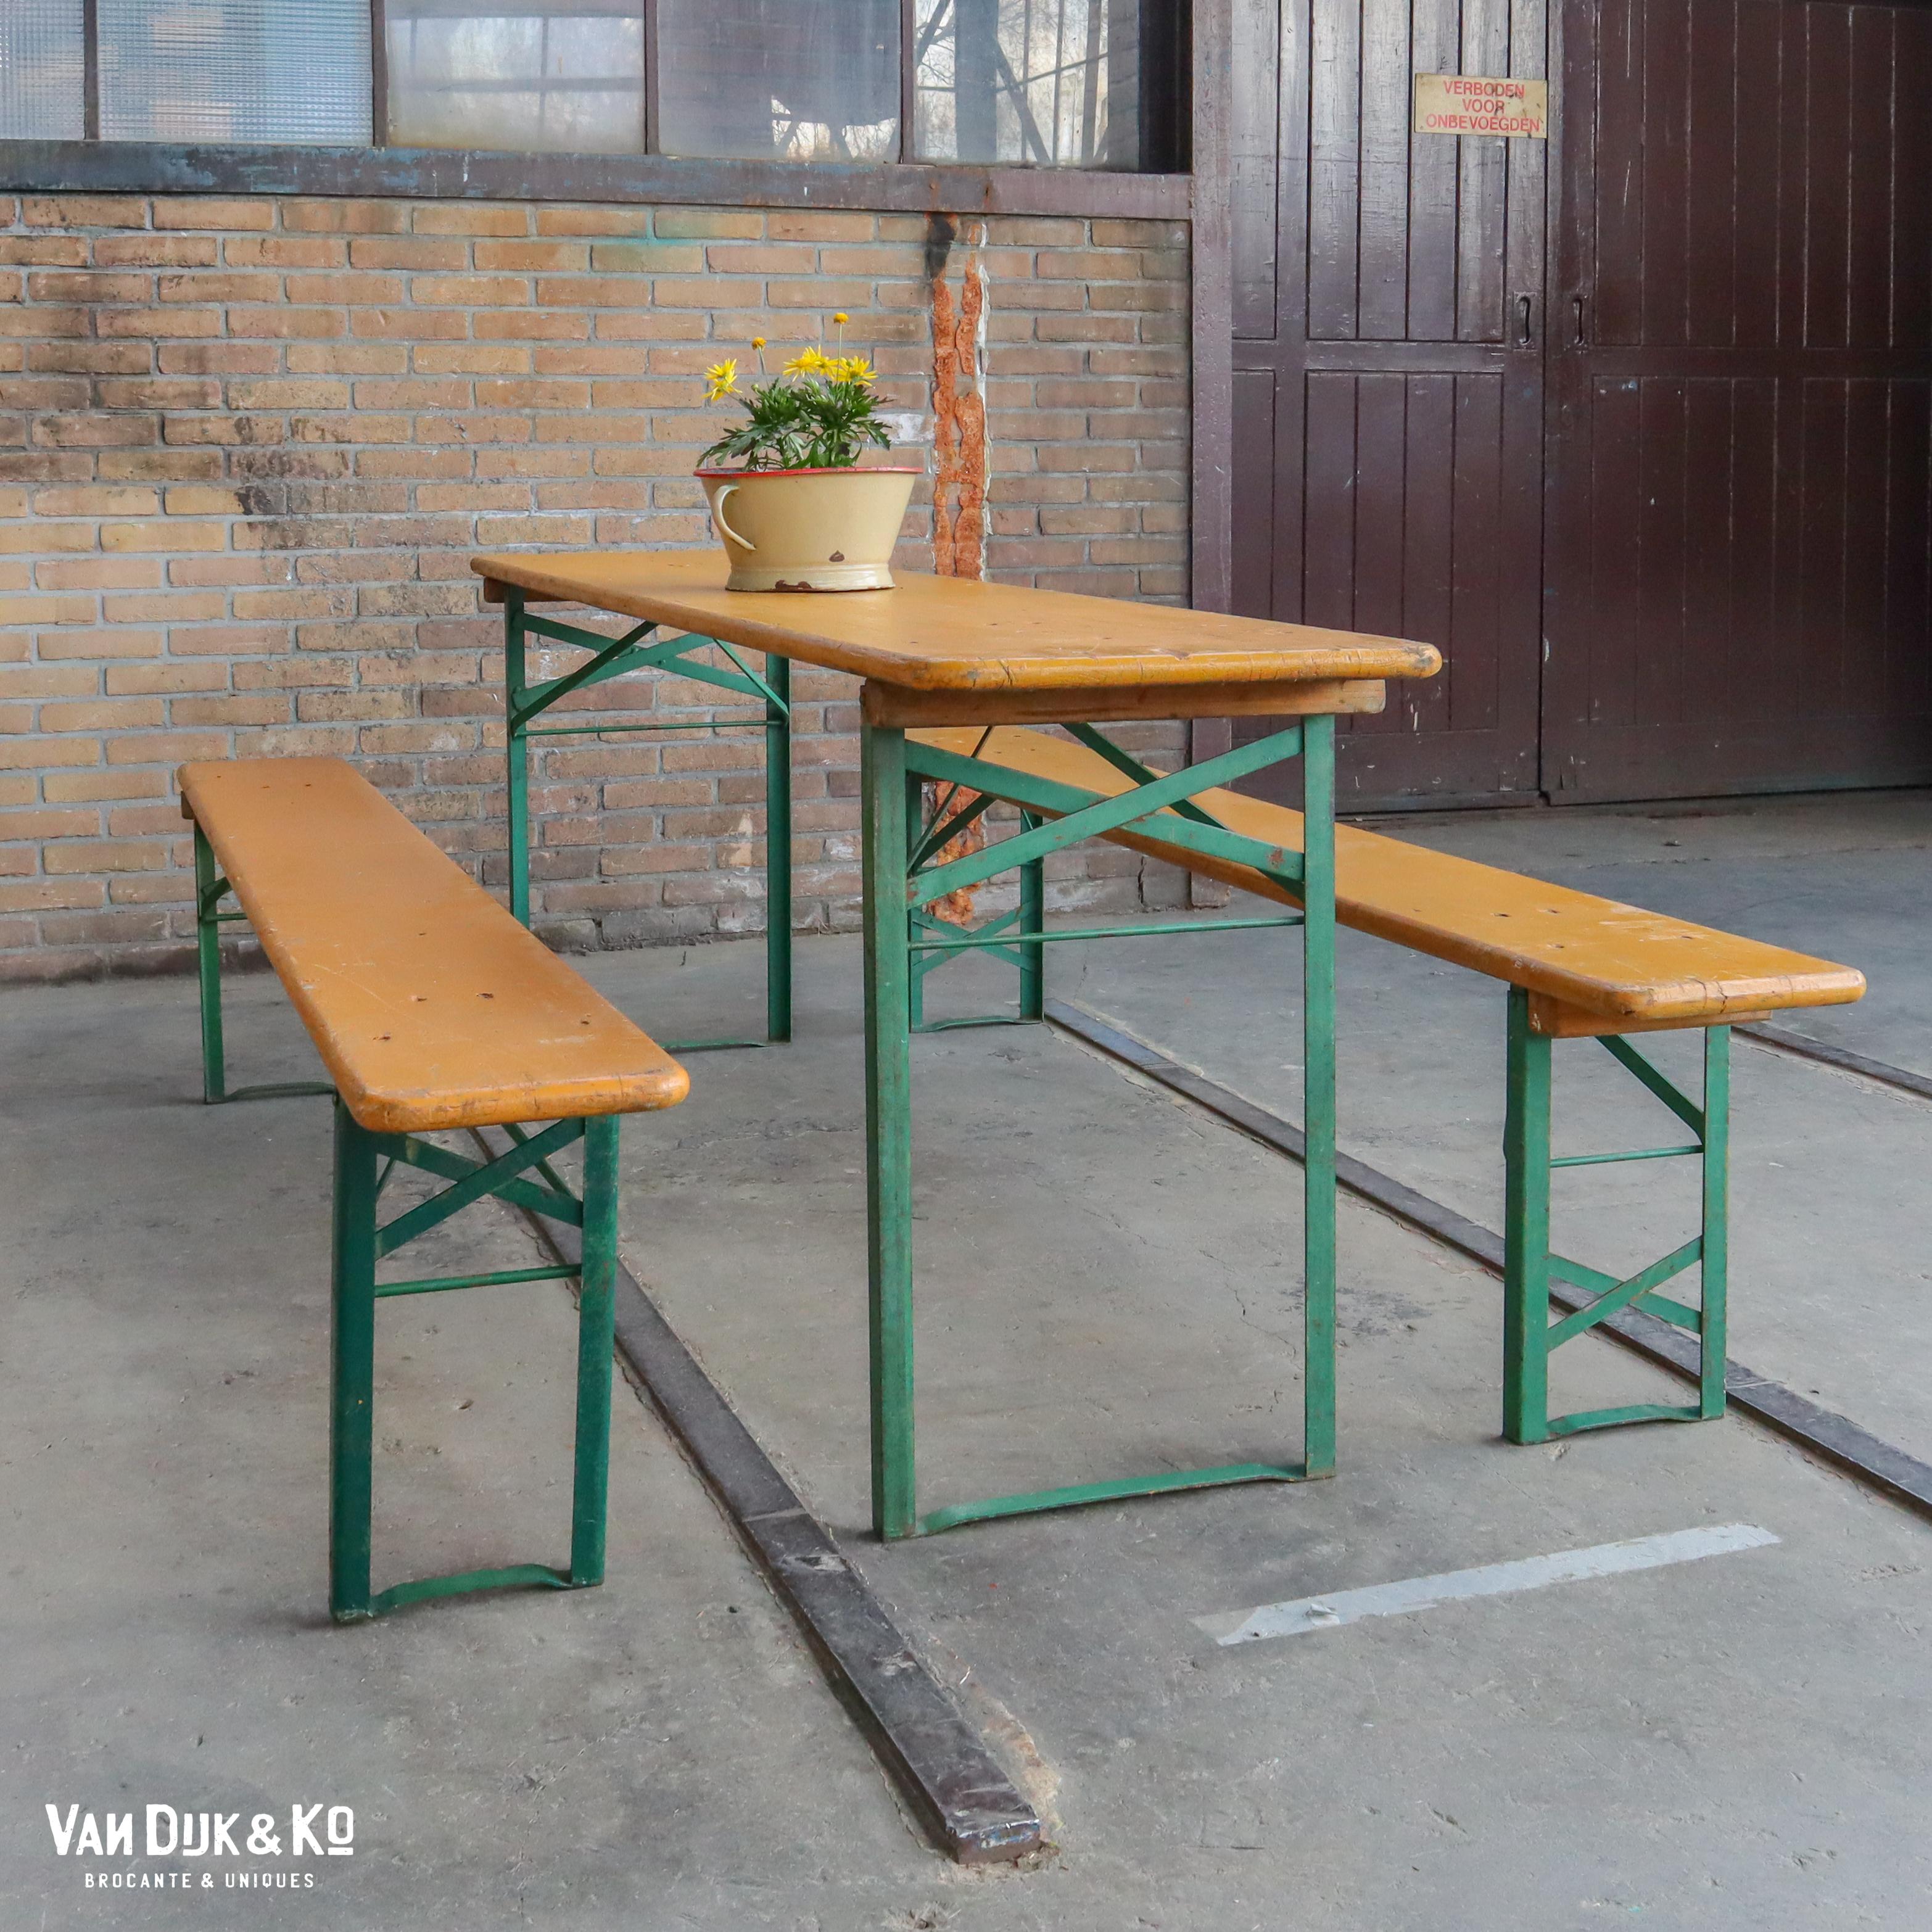 vintage biertafel set